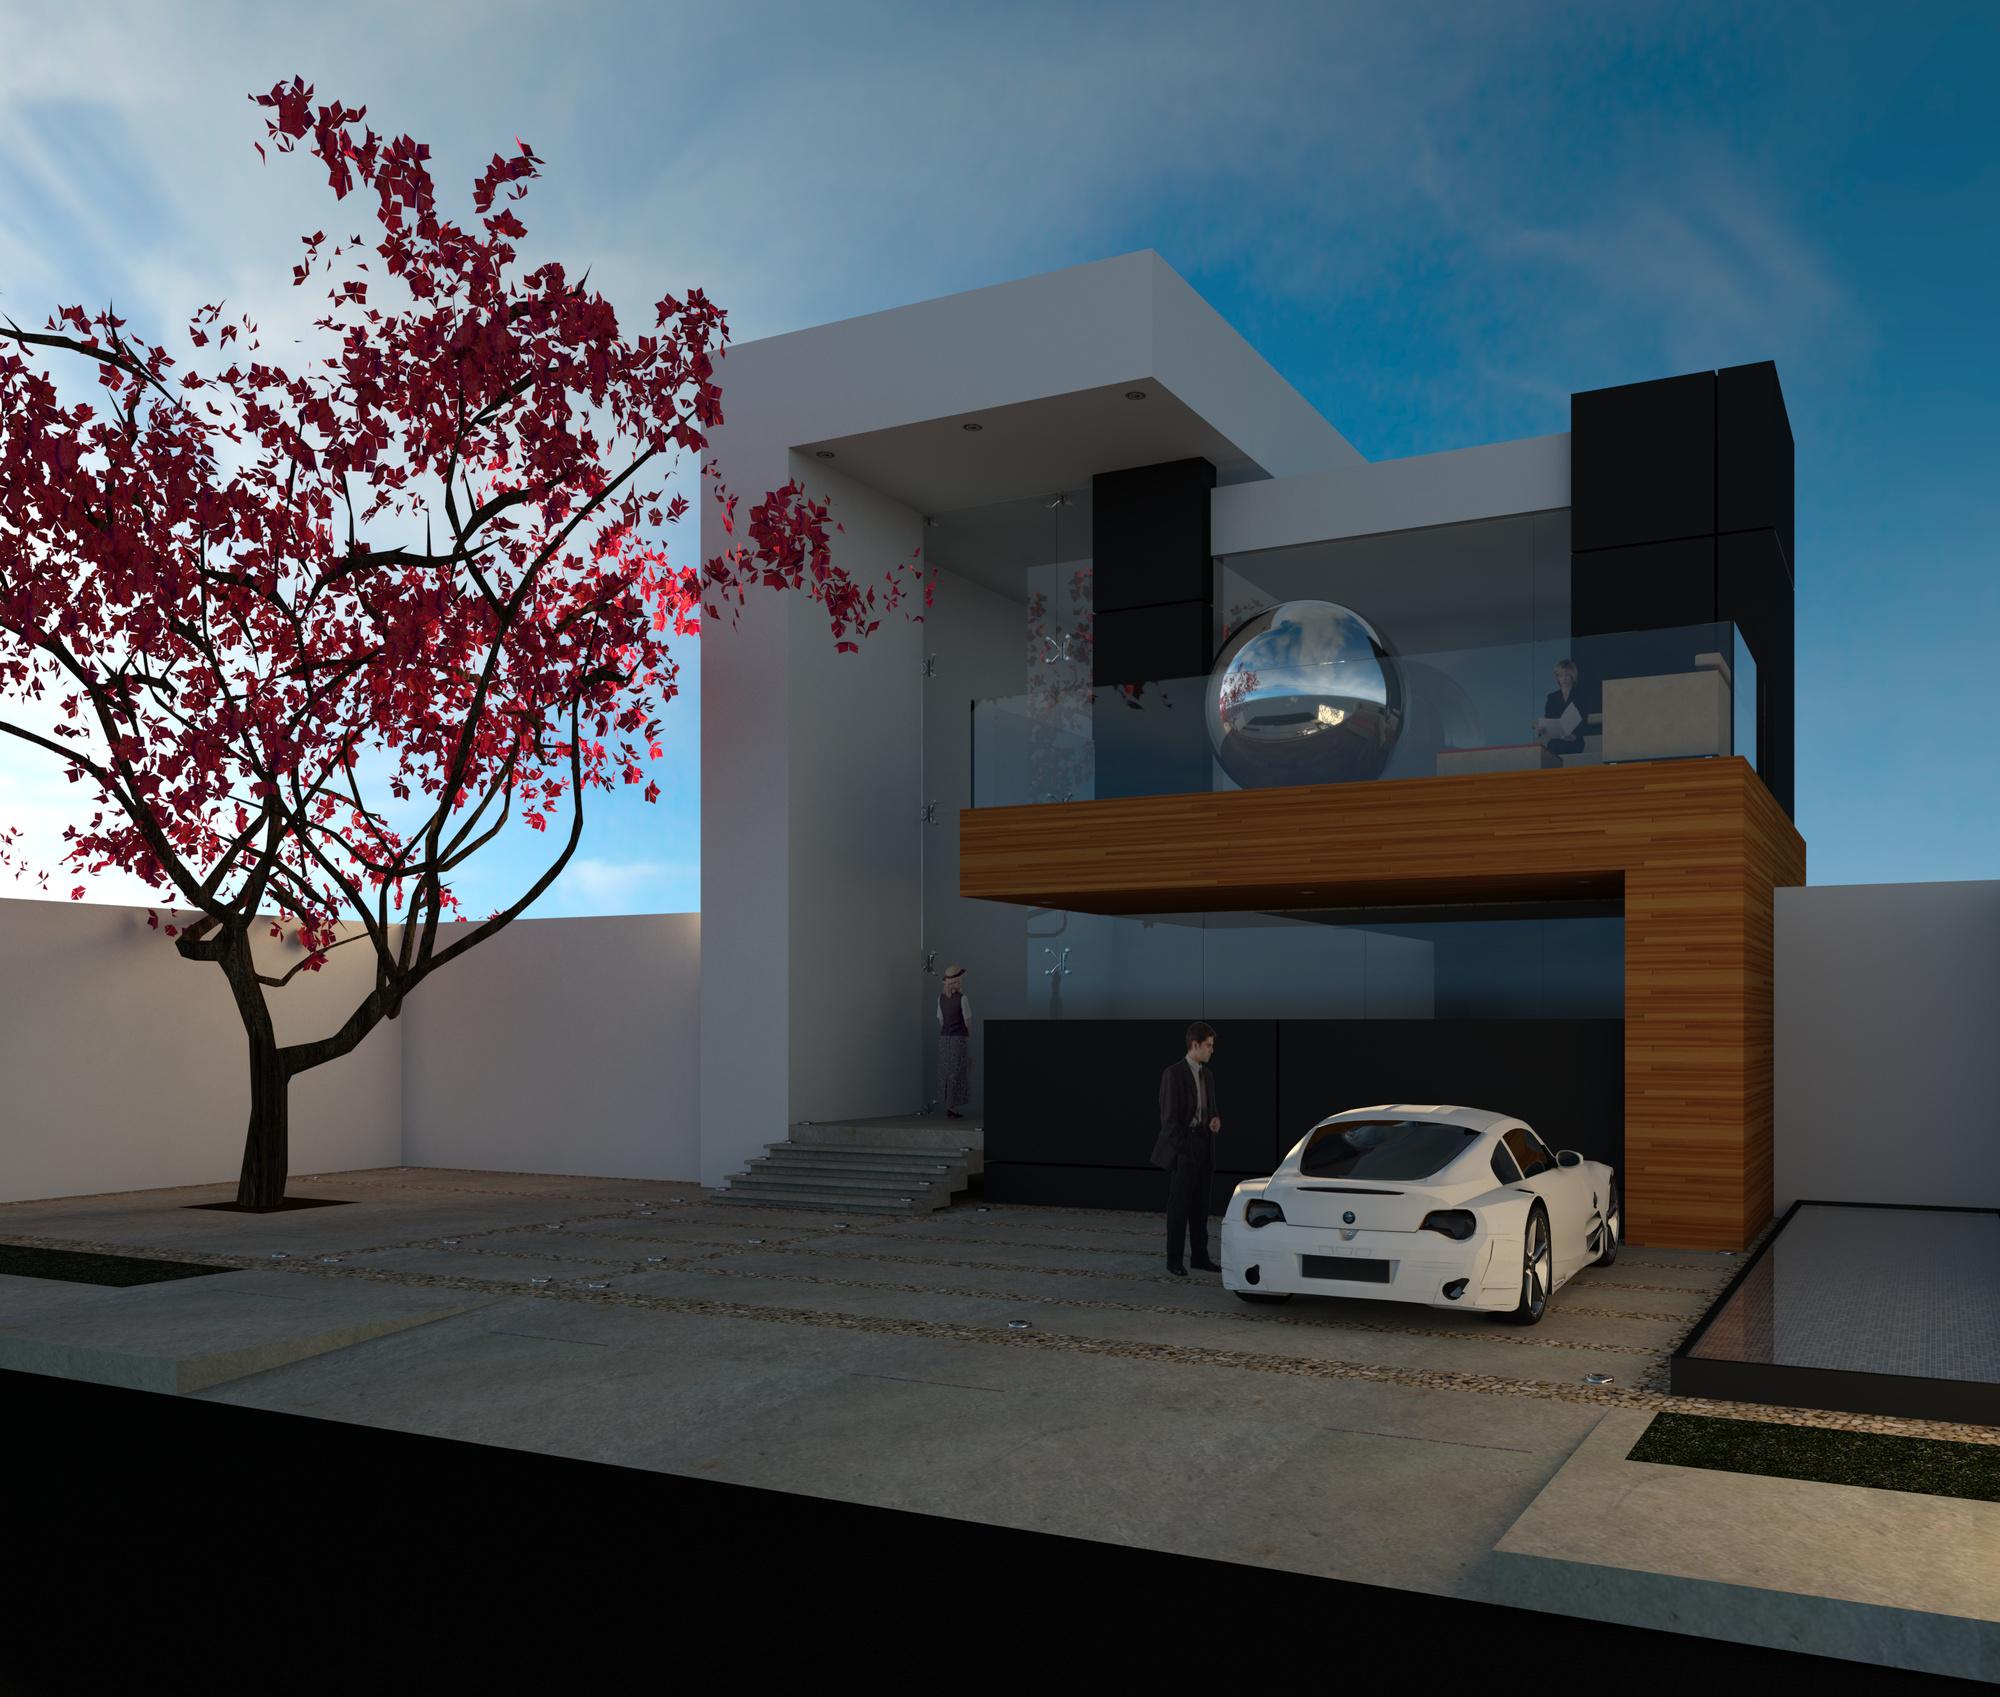 Raas-rendering20150322-26398-1gjt05v